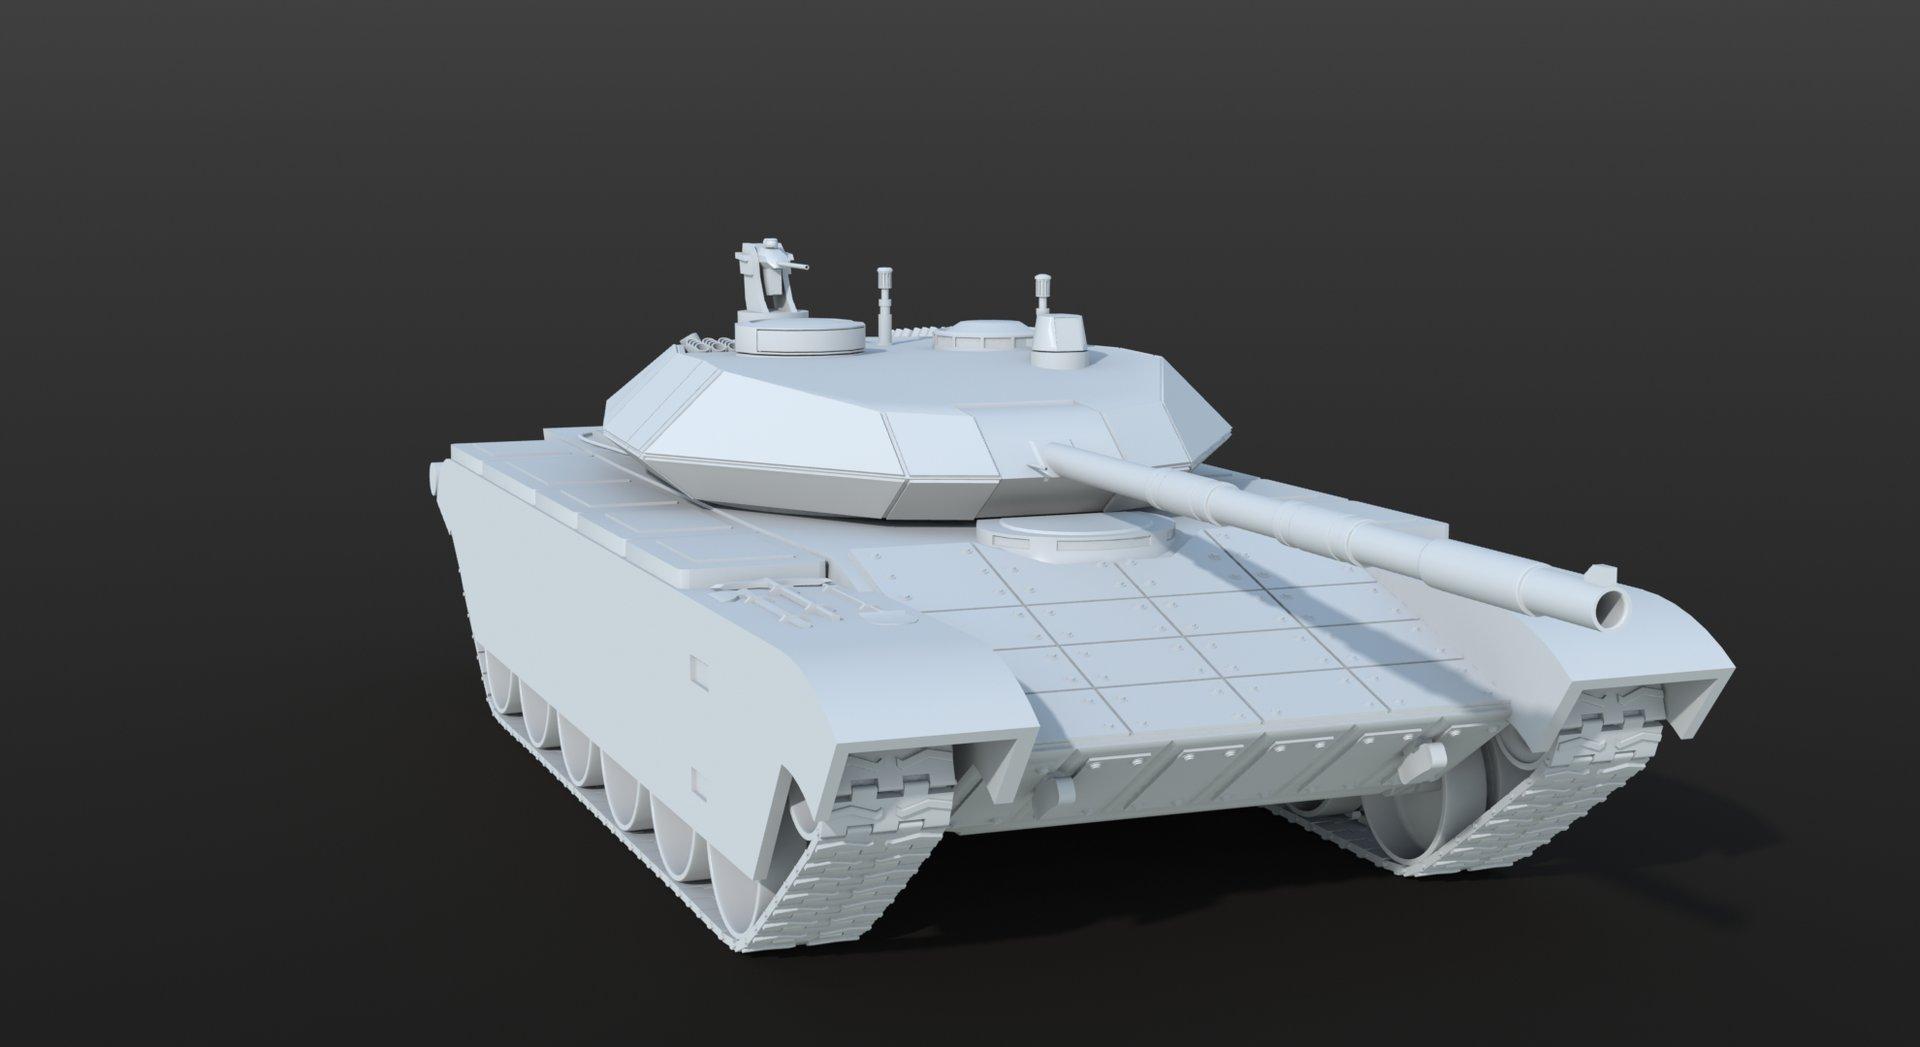 Dusan Saric Concept design of the